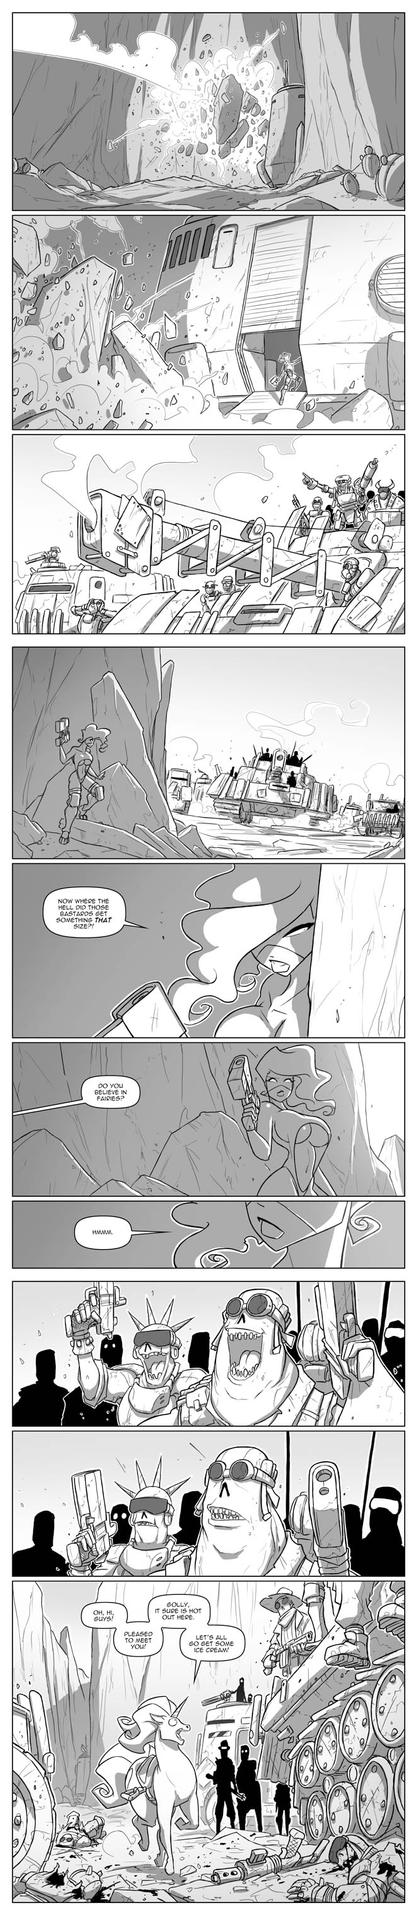 Bad Nero - Backwater - Part 3 by jollyjack